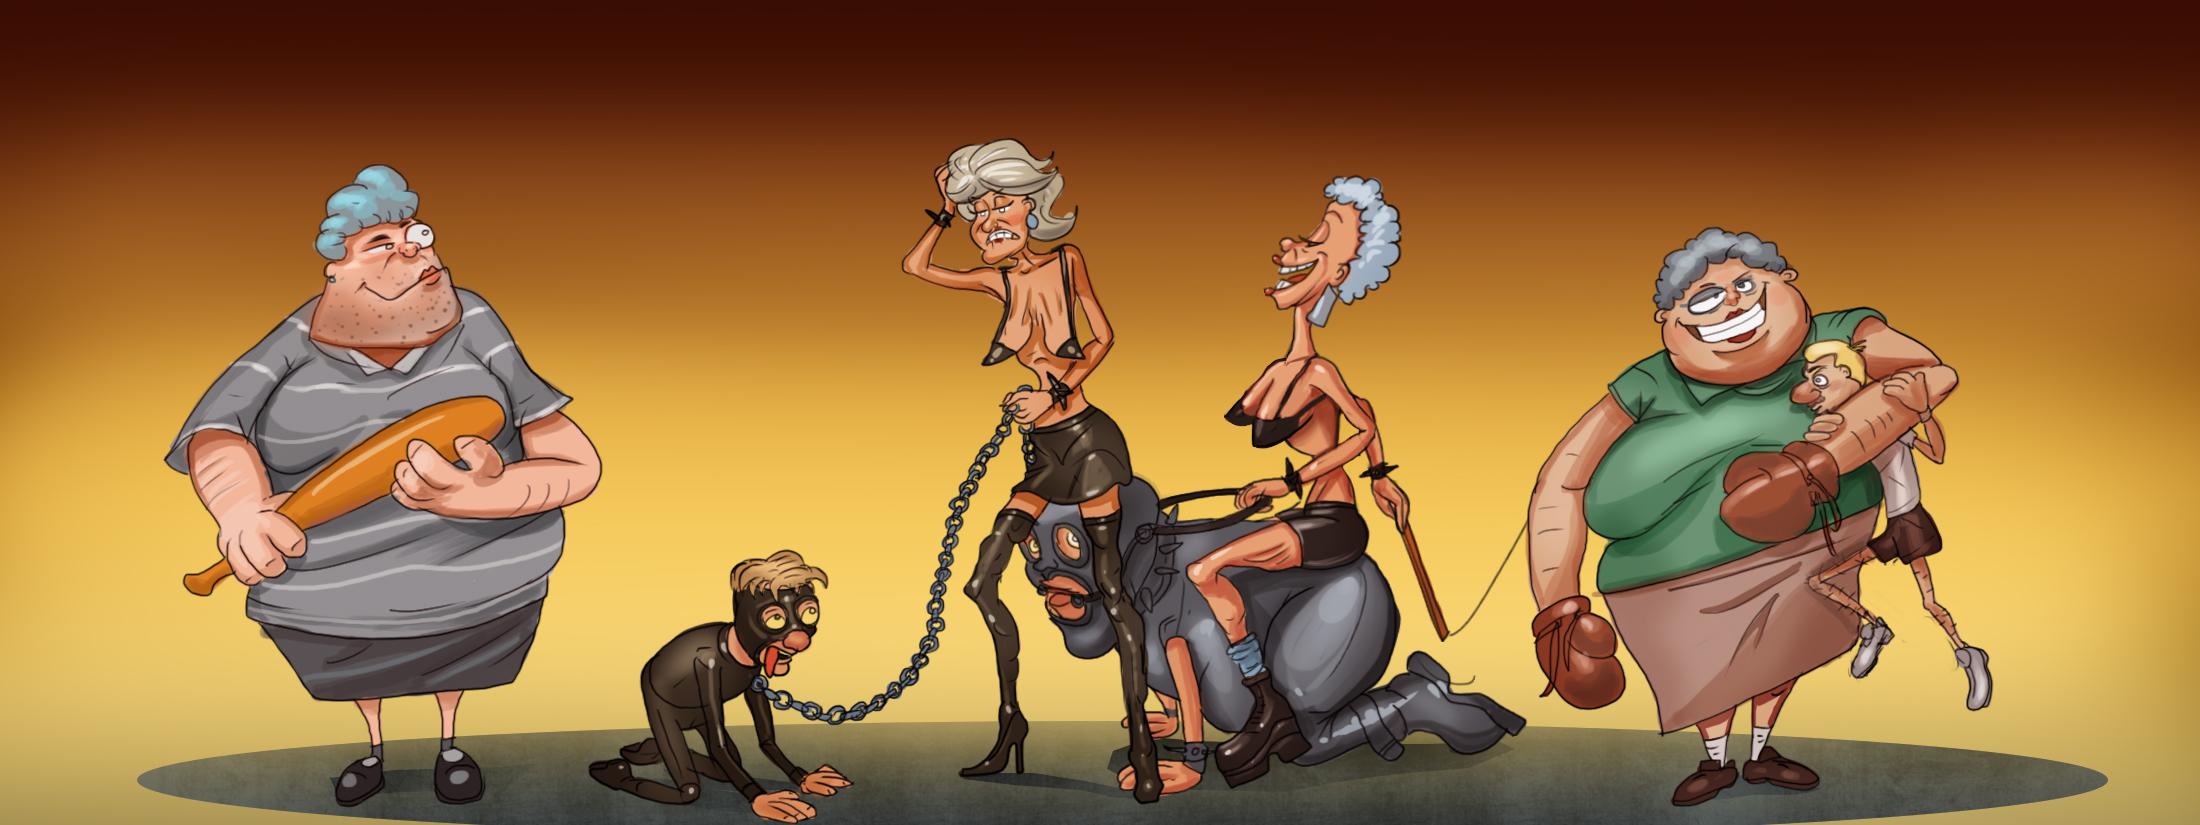 Grannies in action